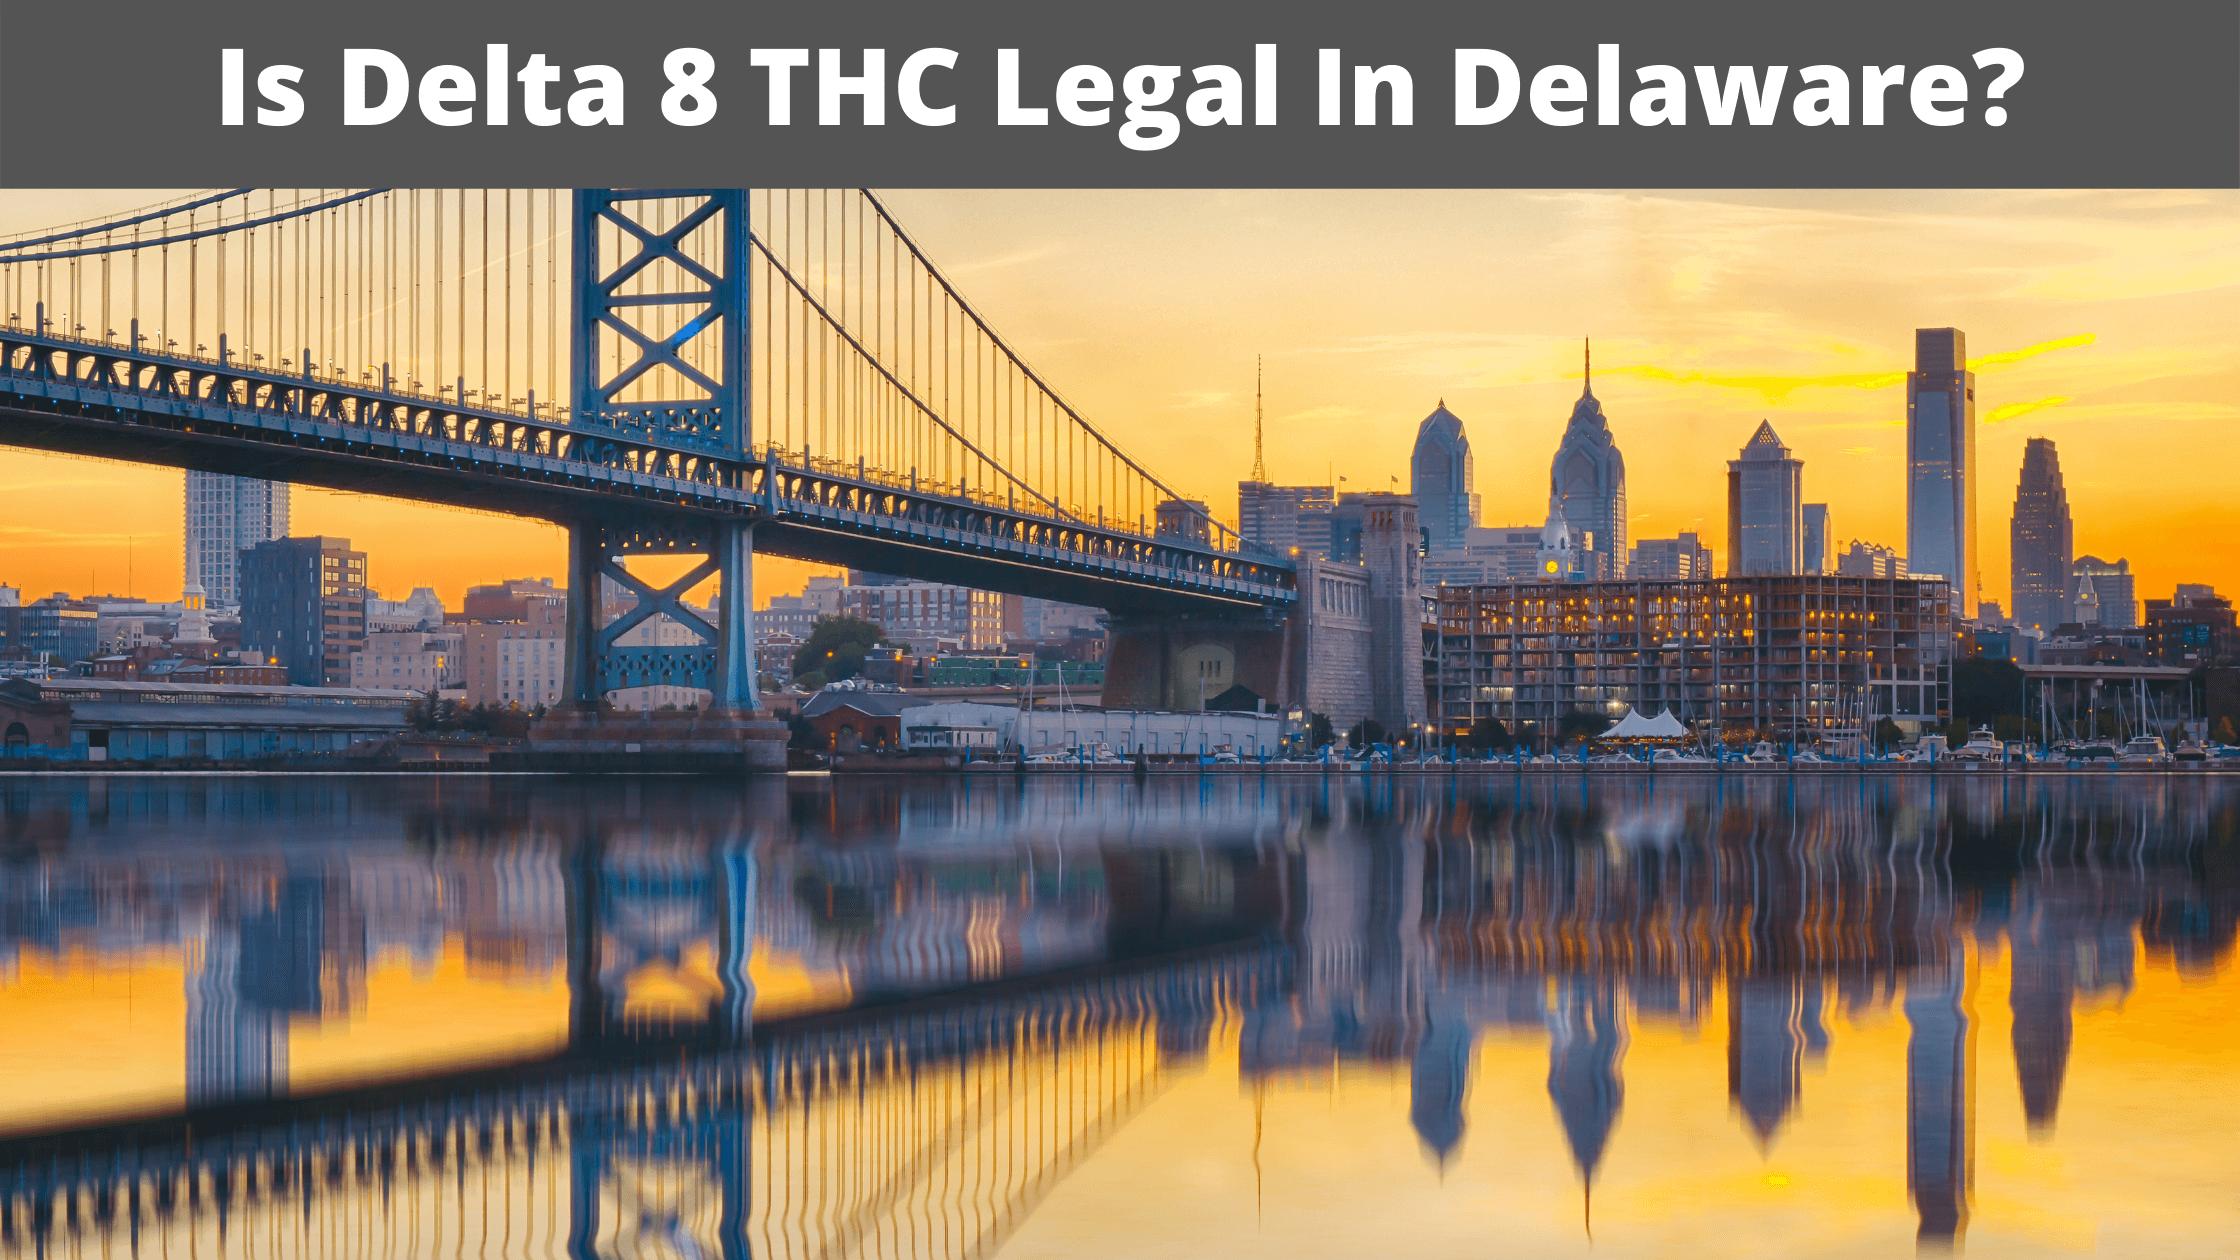 Is Delta 8 THC Legal In Delaware